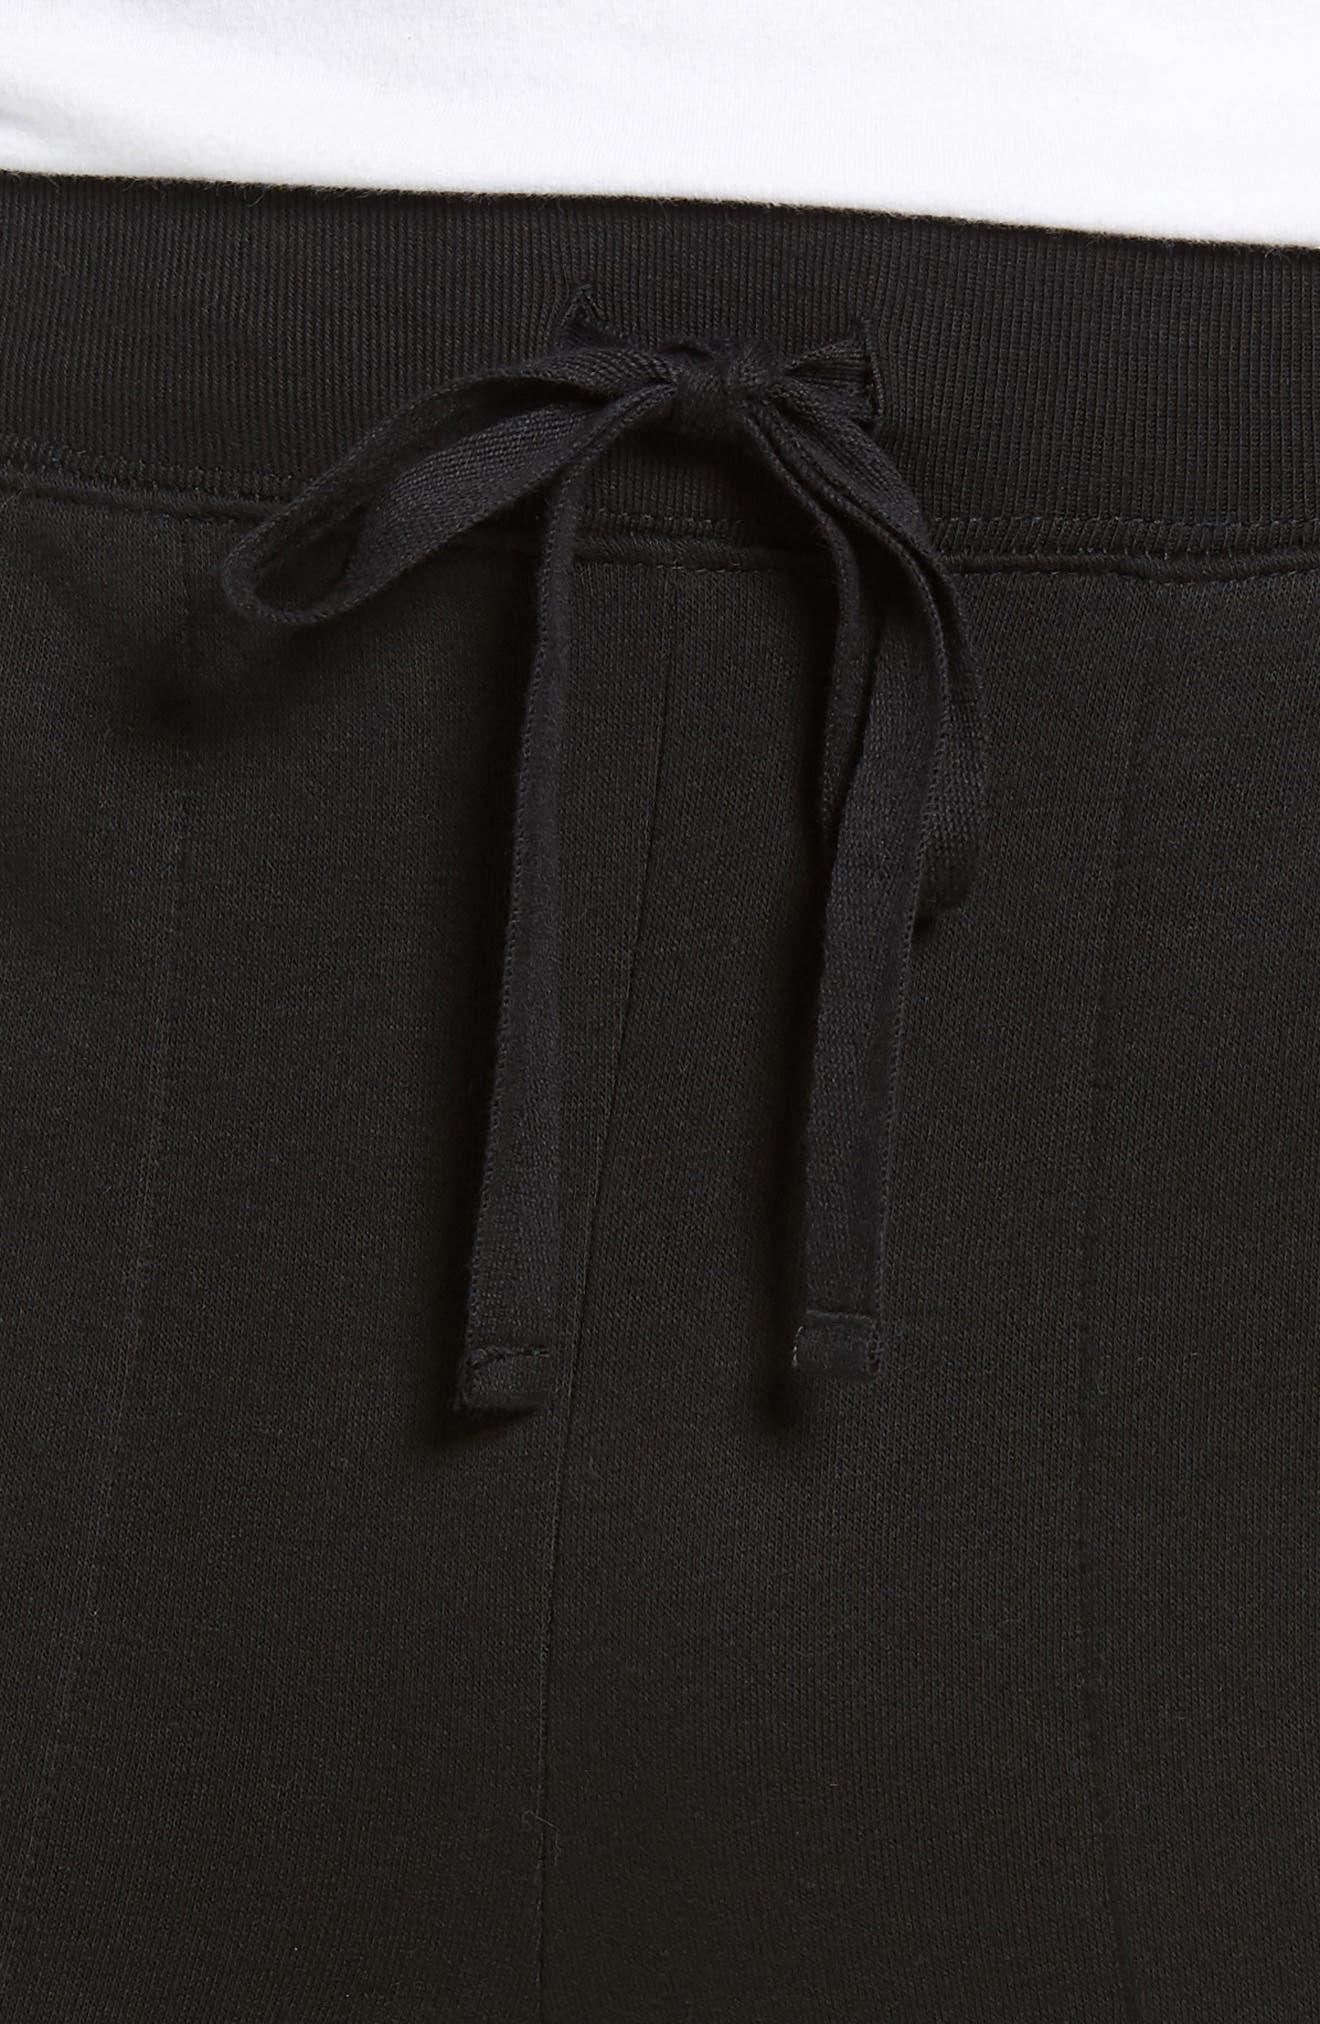 POLO RALPH LAUREN,                             Brushed Jersey Cotton Blend Jogger Pants,                             Alternate thumbnail 4, color,                             POLO BLACK